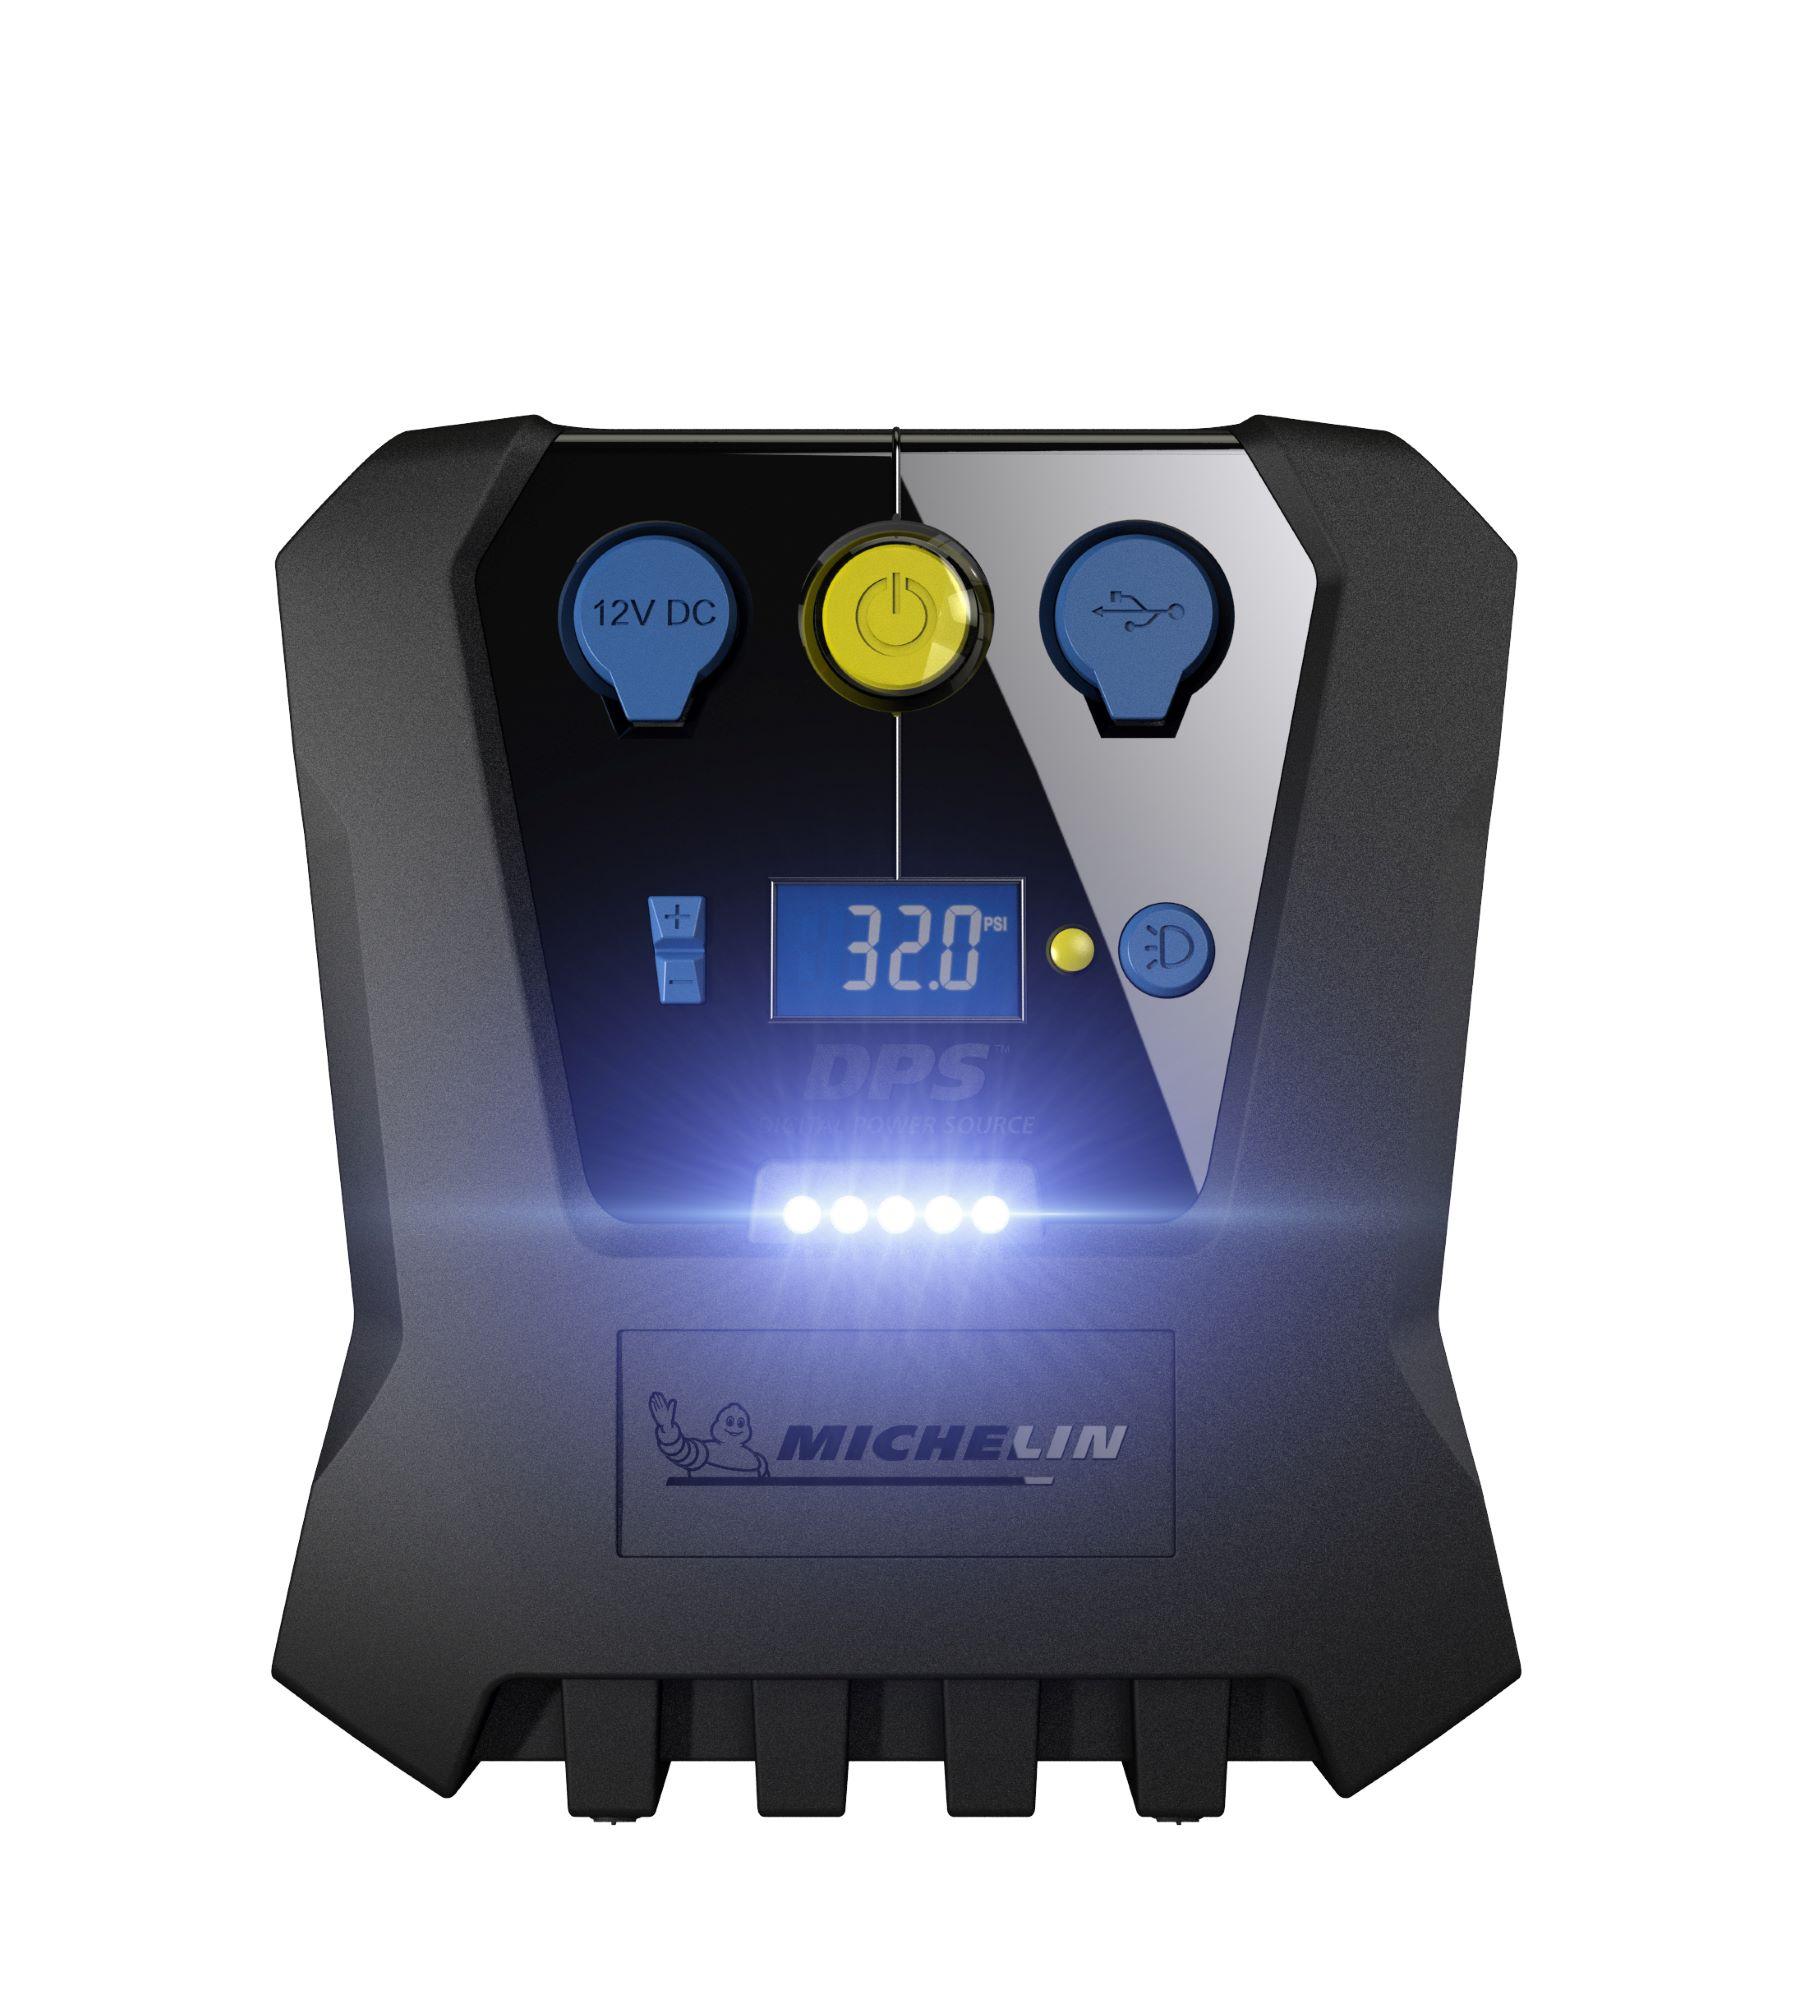 Michelin - Digital High Power Fast Flow Tyre Inflator 12V - Programmable